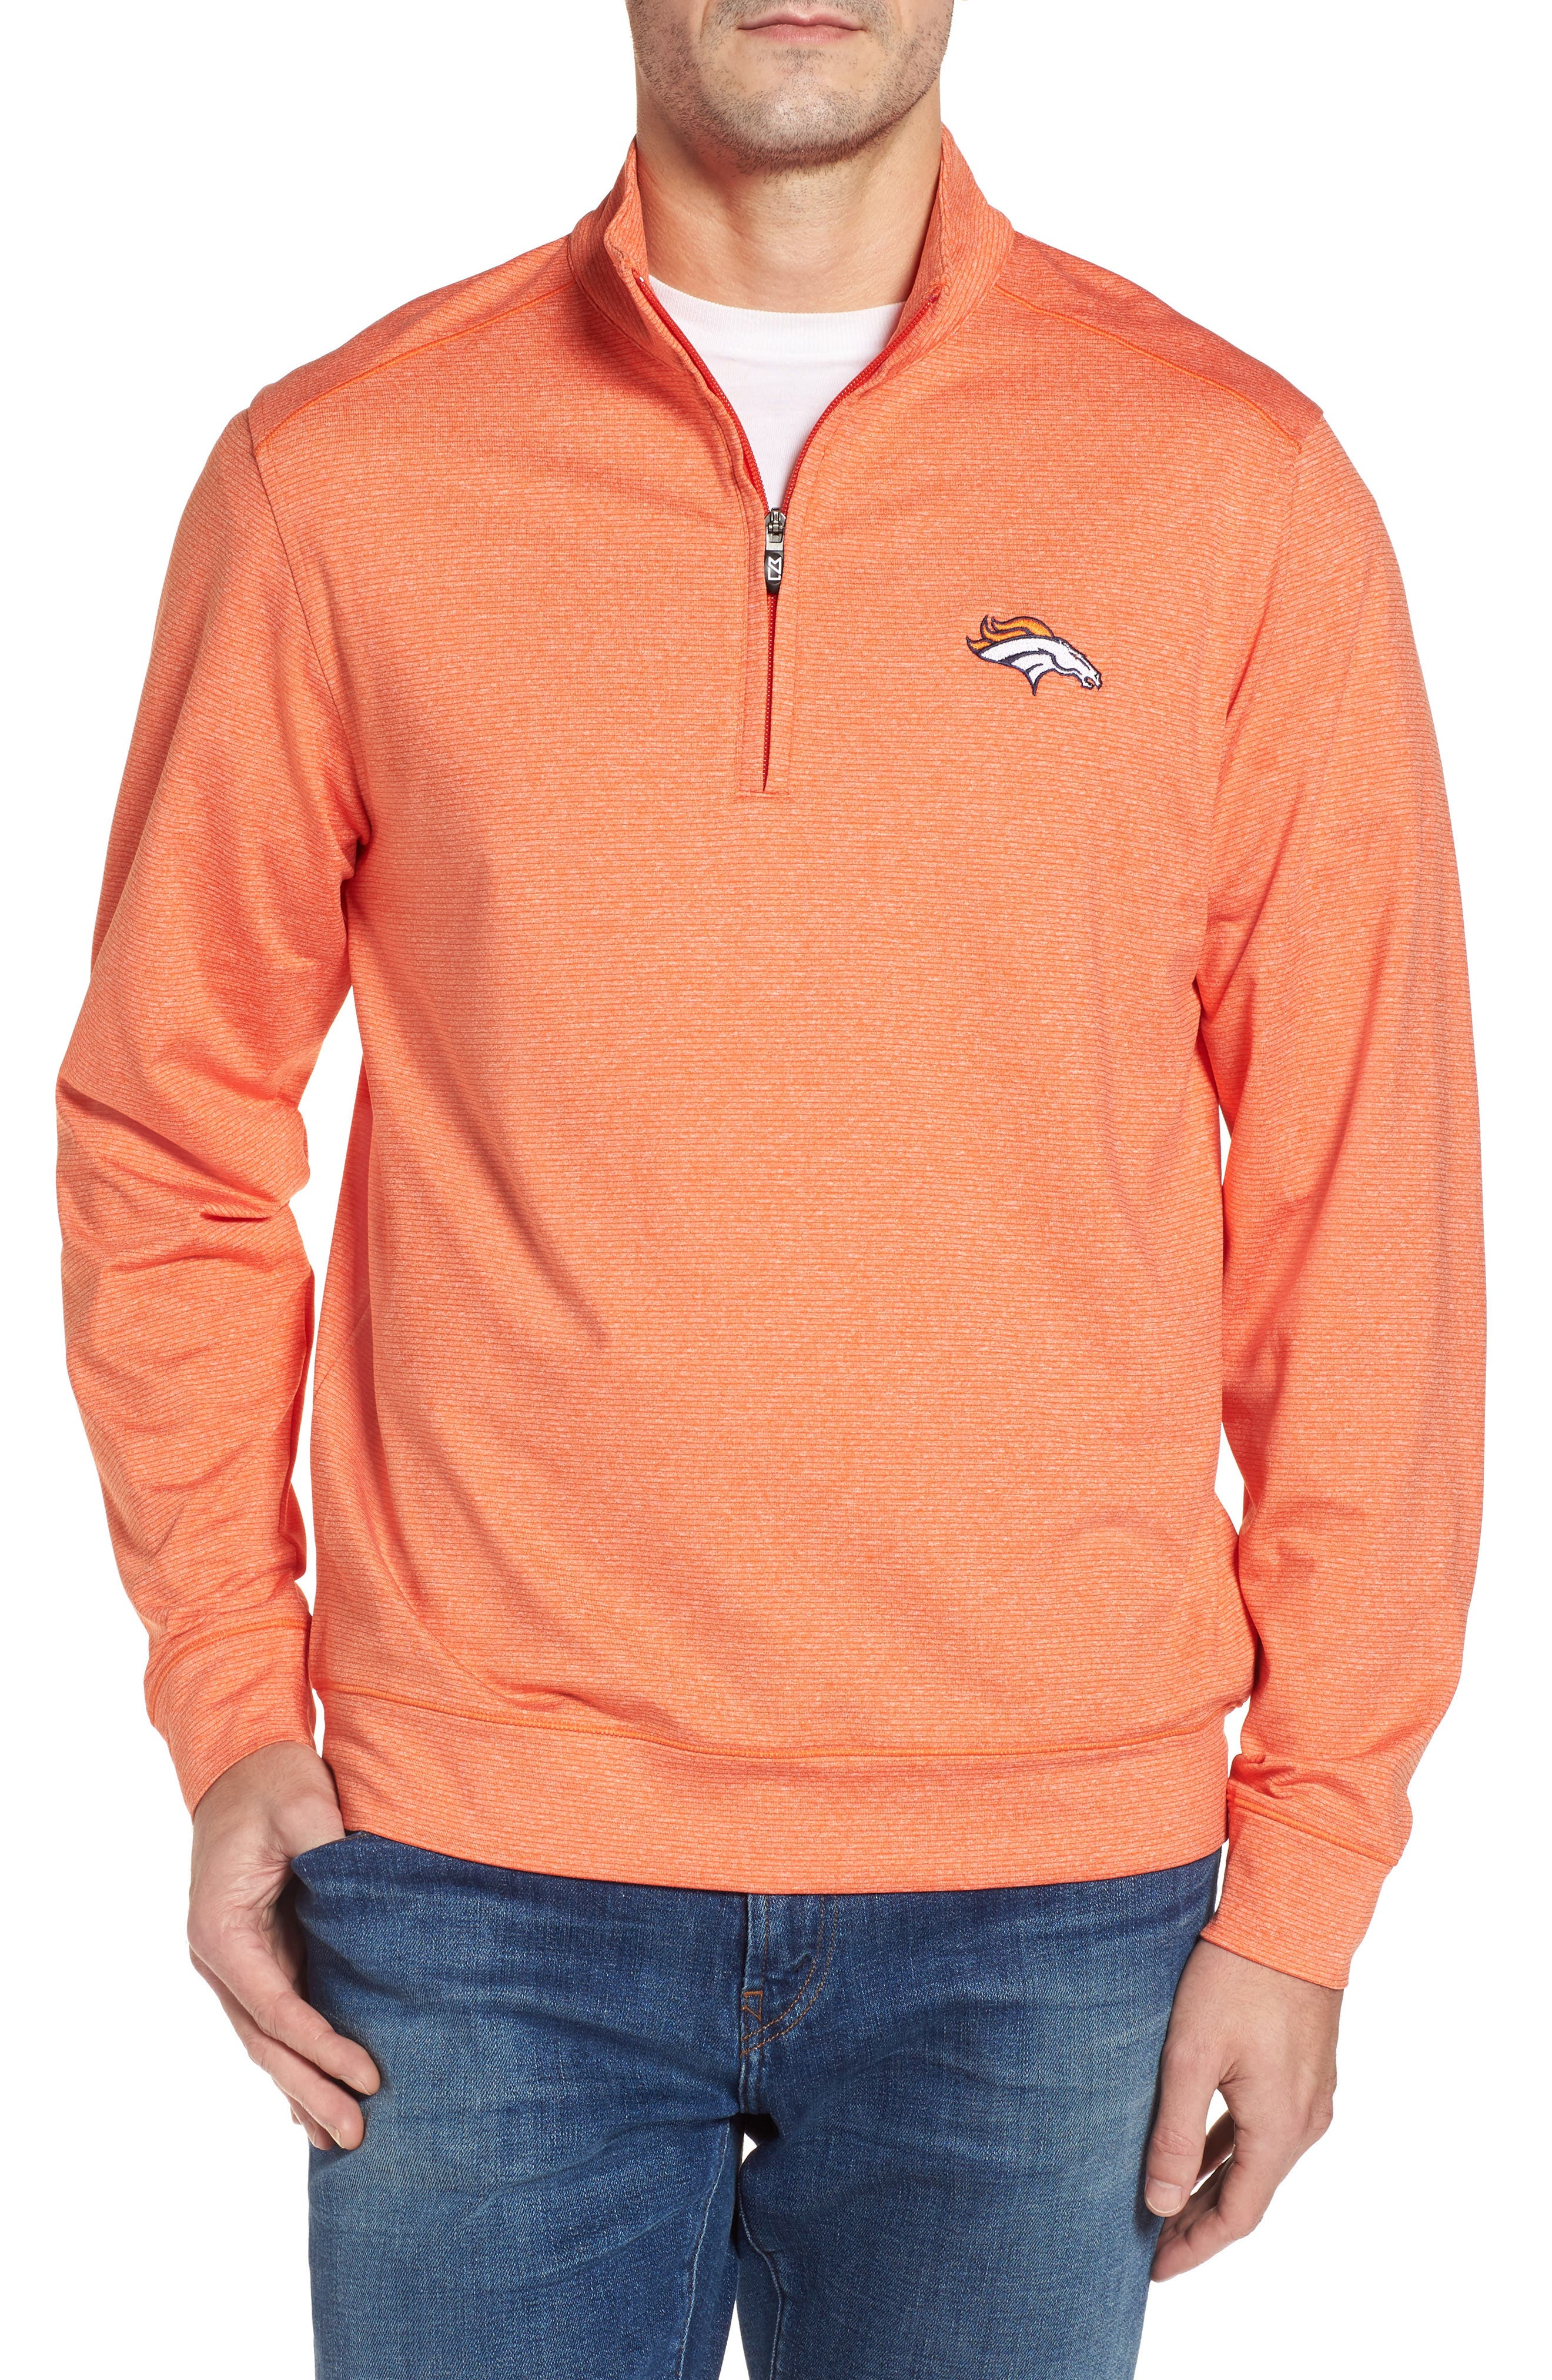 Cutter & Buck Shoreline - Denver Broncos Half Zip Pullover